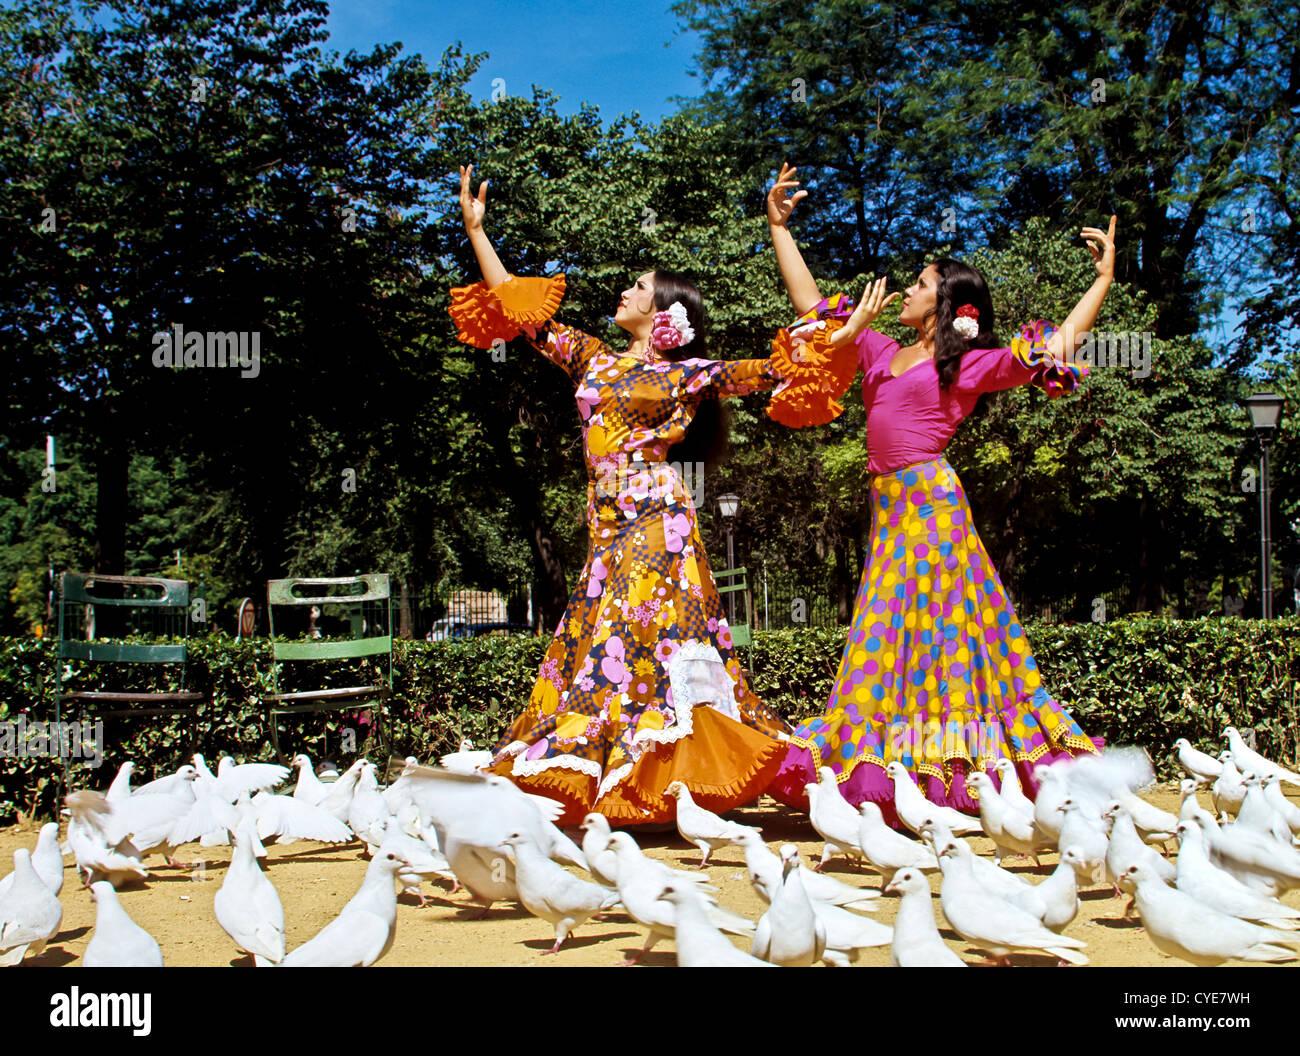 8337. Danseurs de Flamenco, Séville, Espagne, Europe Photo Stock